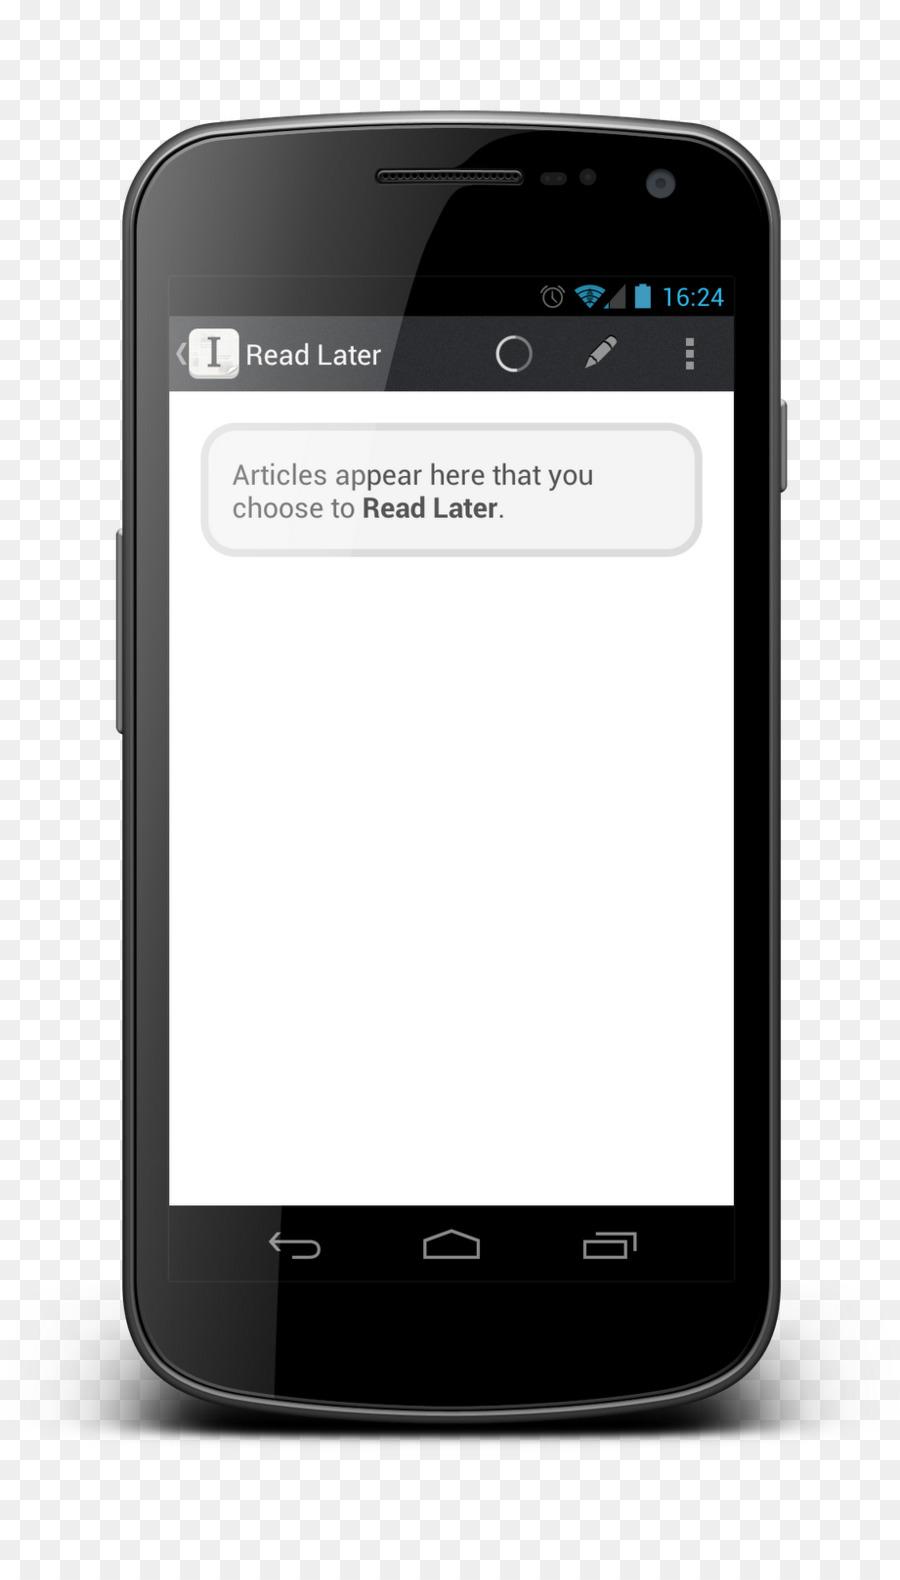 Cartoon Phone png download - 921*1600 - Free Transparent